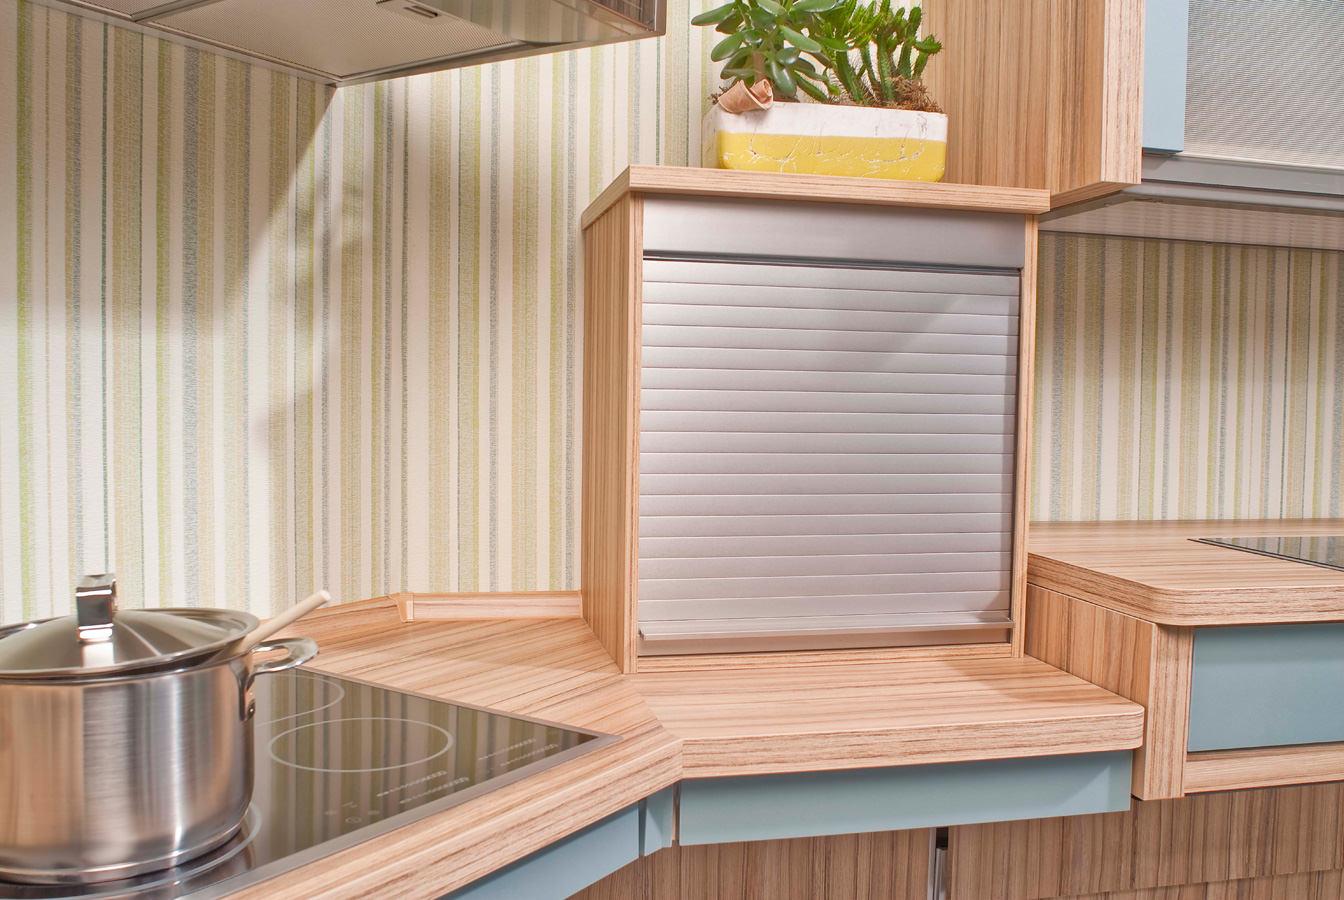 mobilit tsk che barrierefrei f r ein selbstbestimmtes leben. Black Bedroom Furniture Sets. Home Design Ideas